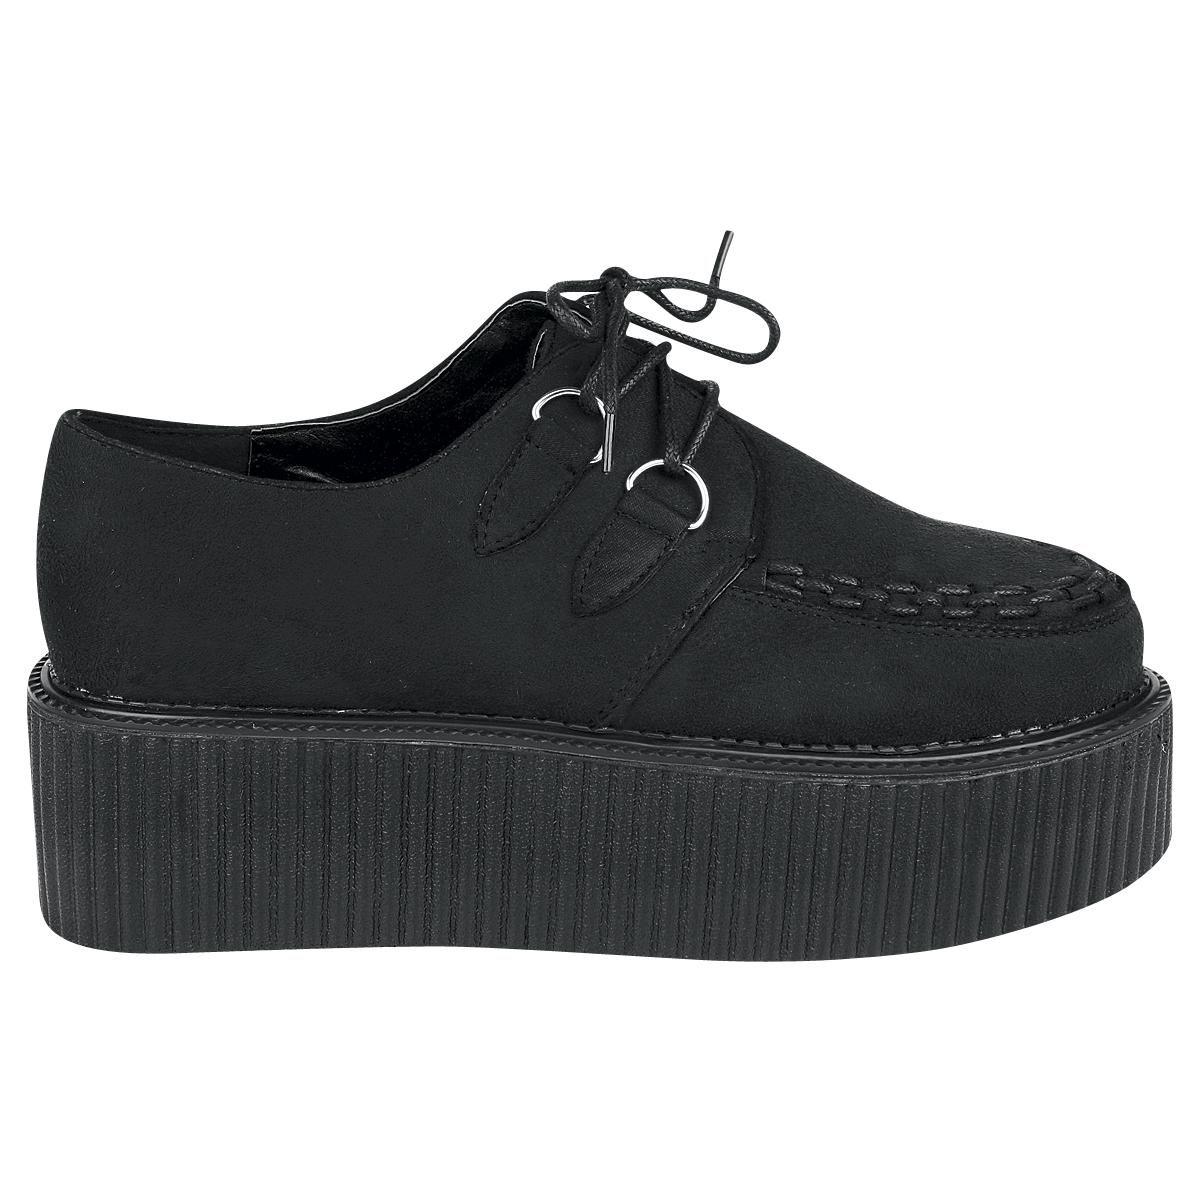 Industrial Punk Creeper Zapatillas Negro QQUue